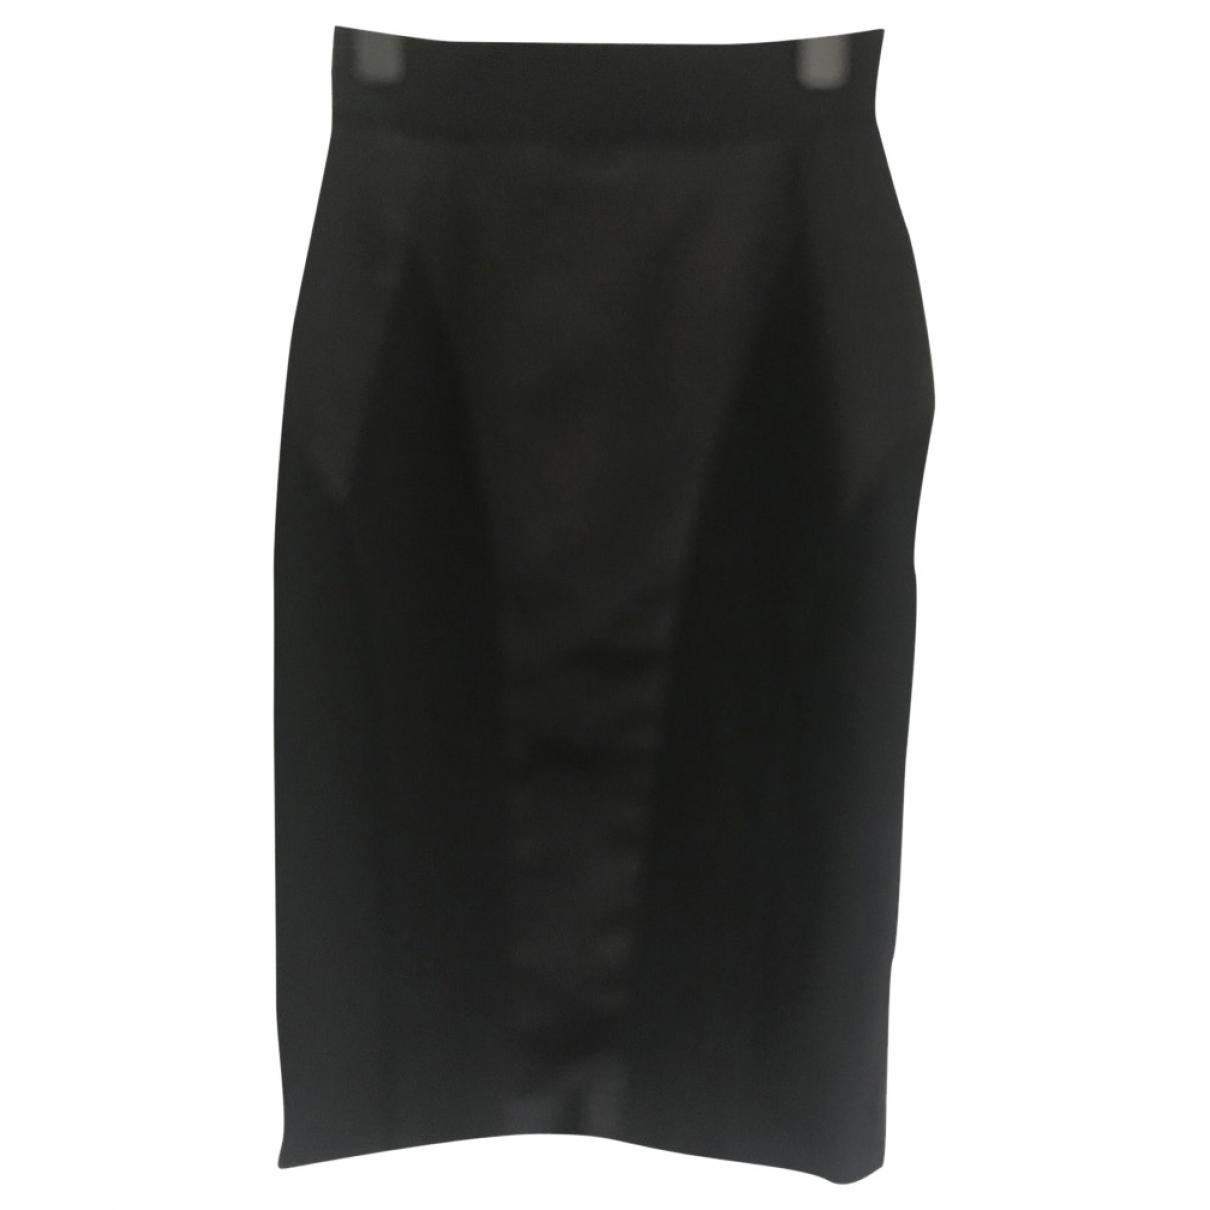 Dolce & Gabbana \N Black Wool skirt for Women 42 IT